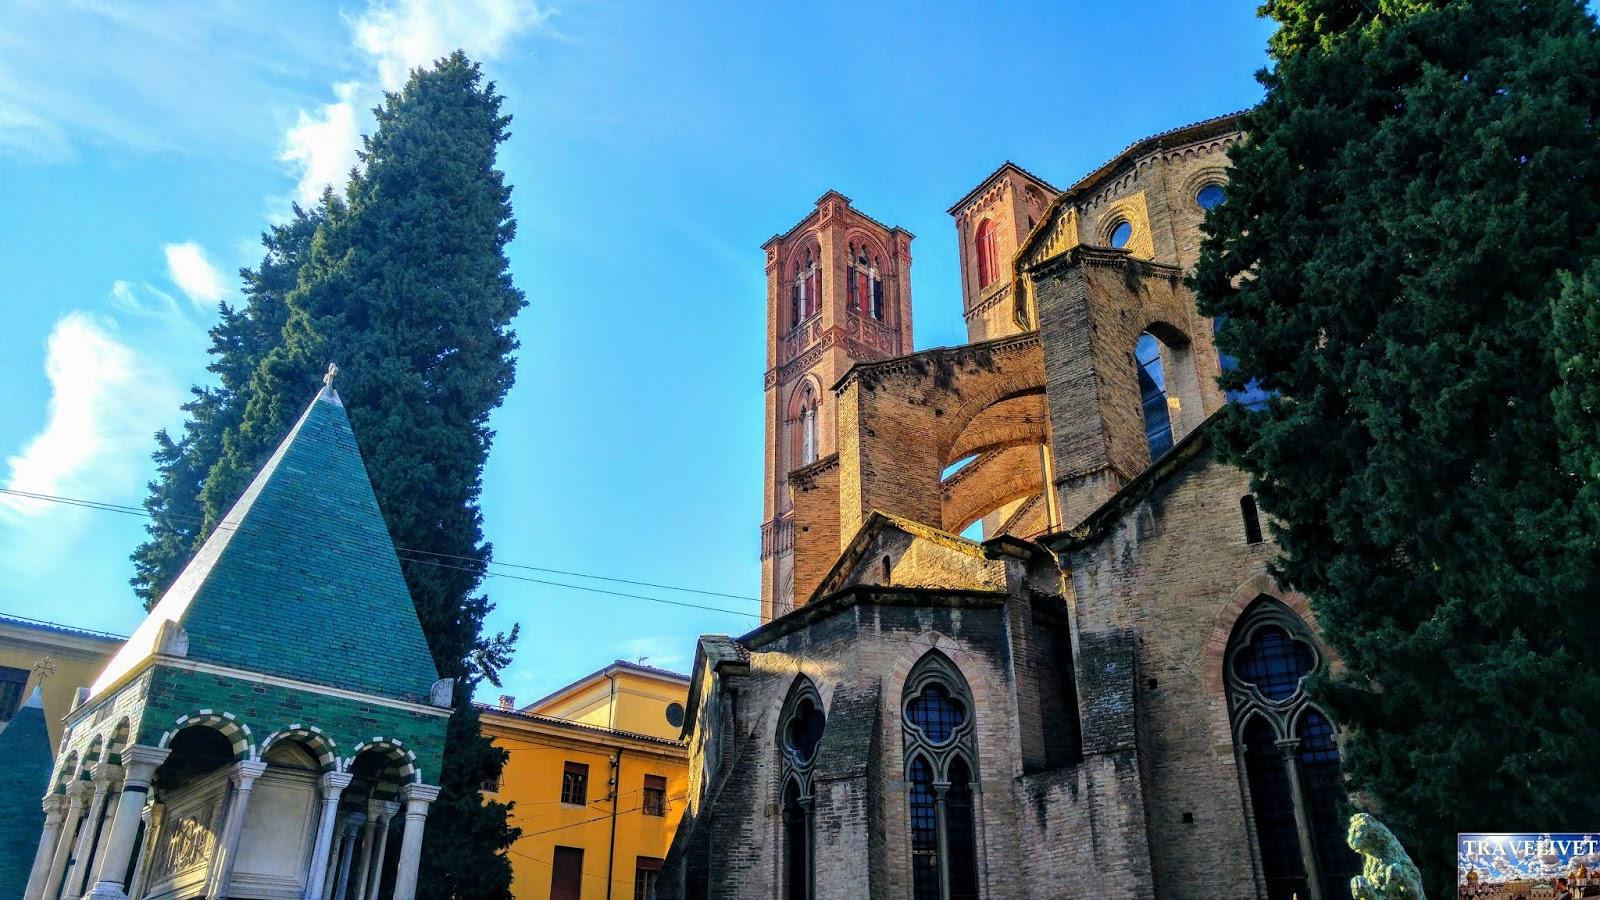 Visiter Bologne / Bologna en 2 jours pendant ton Week-end